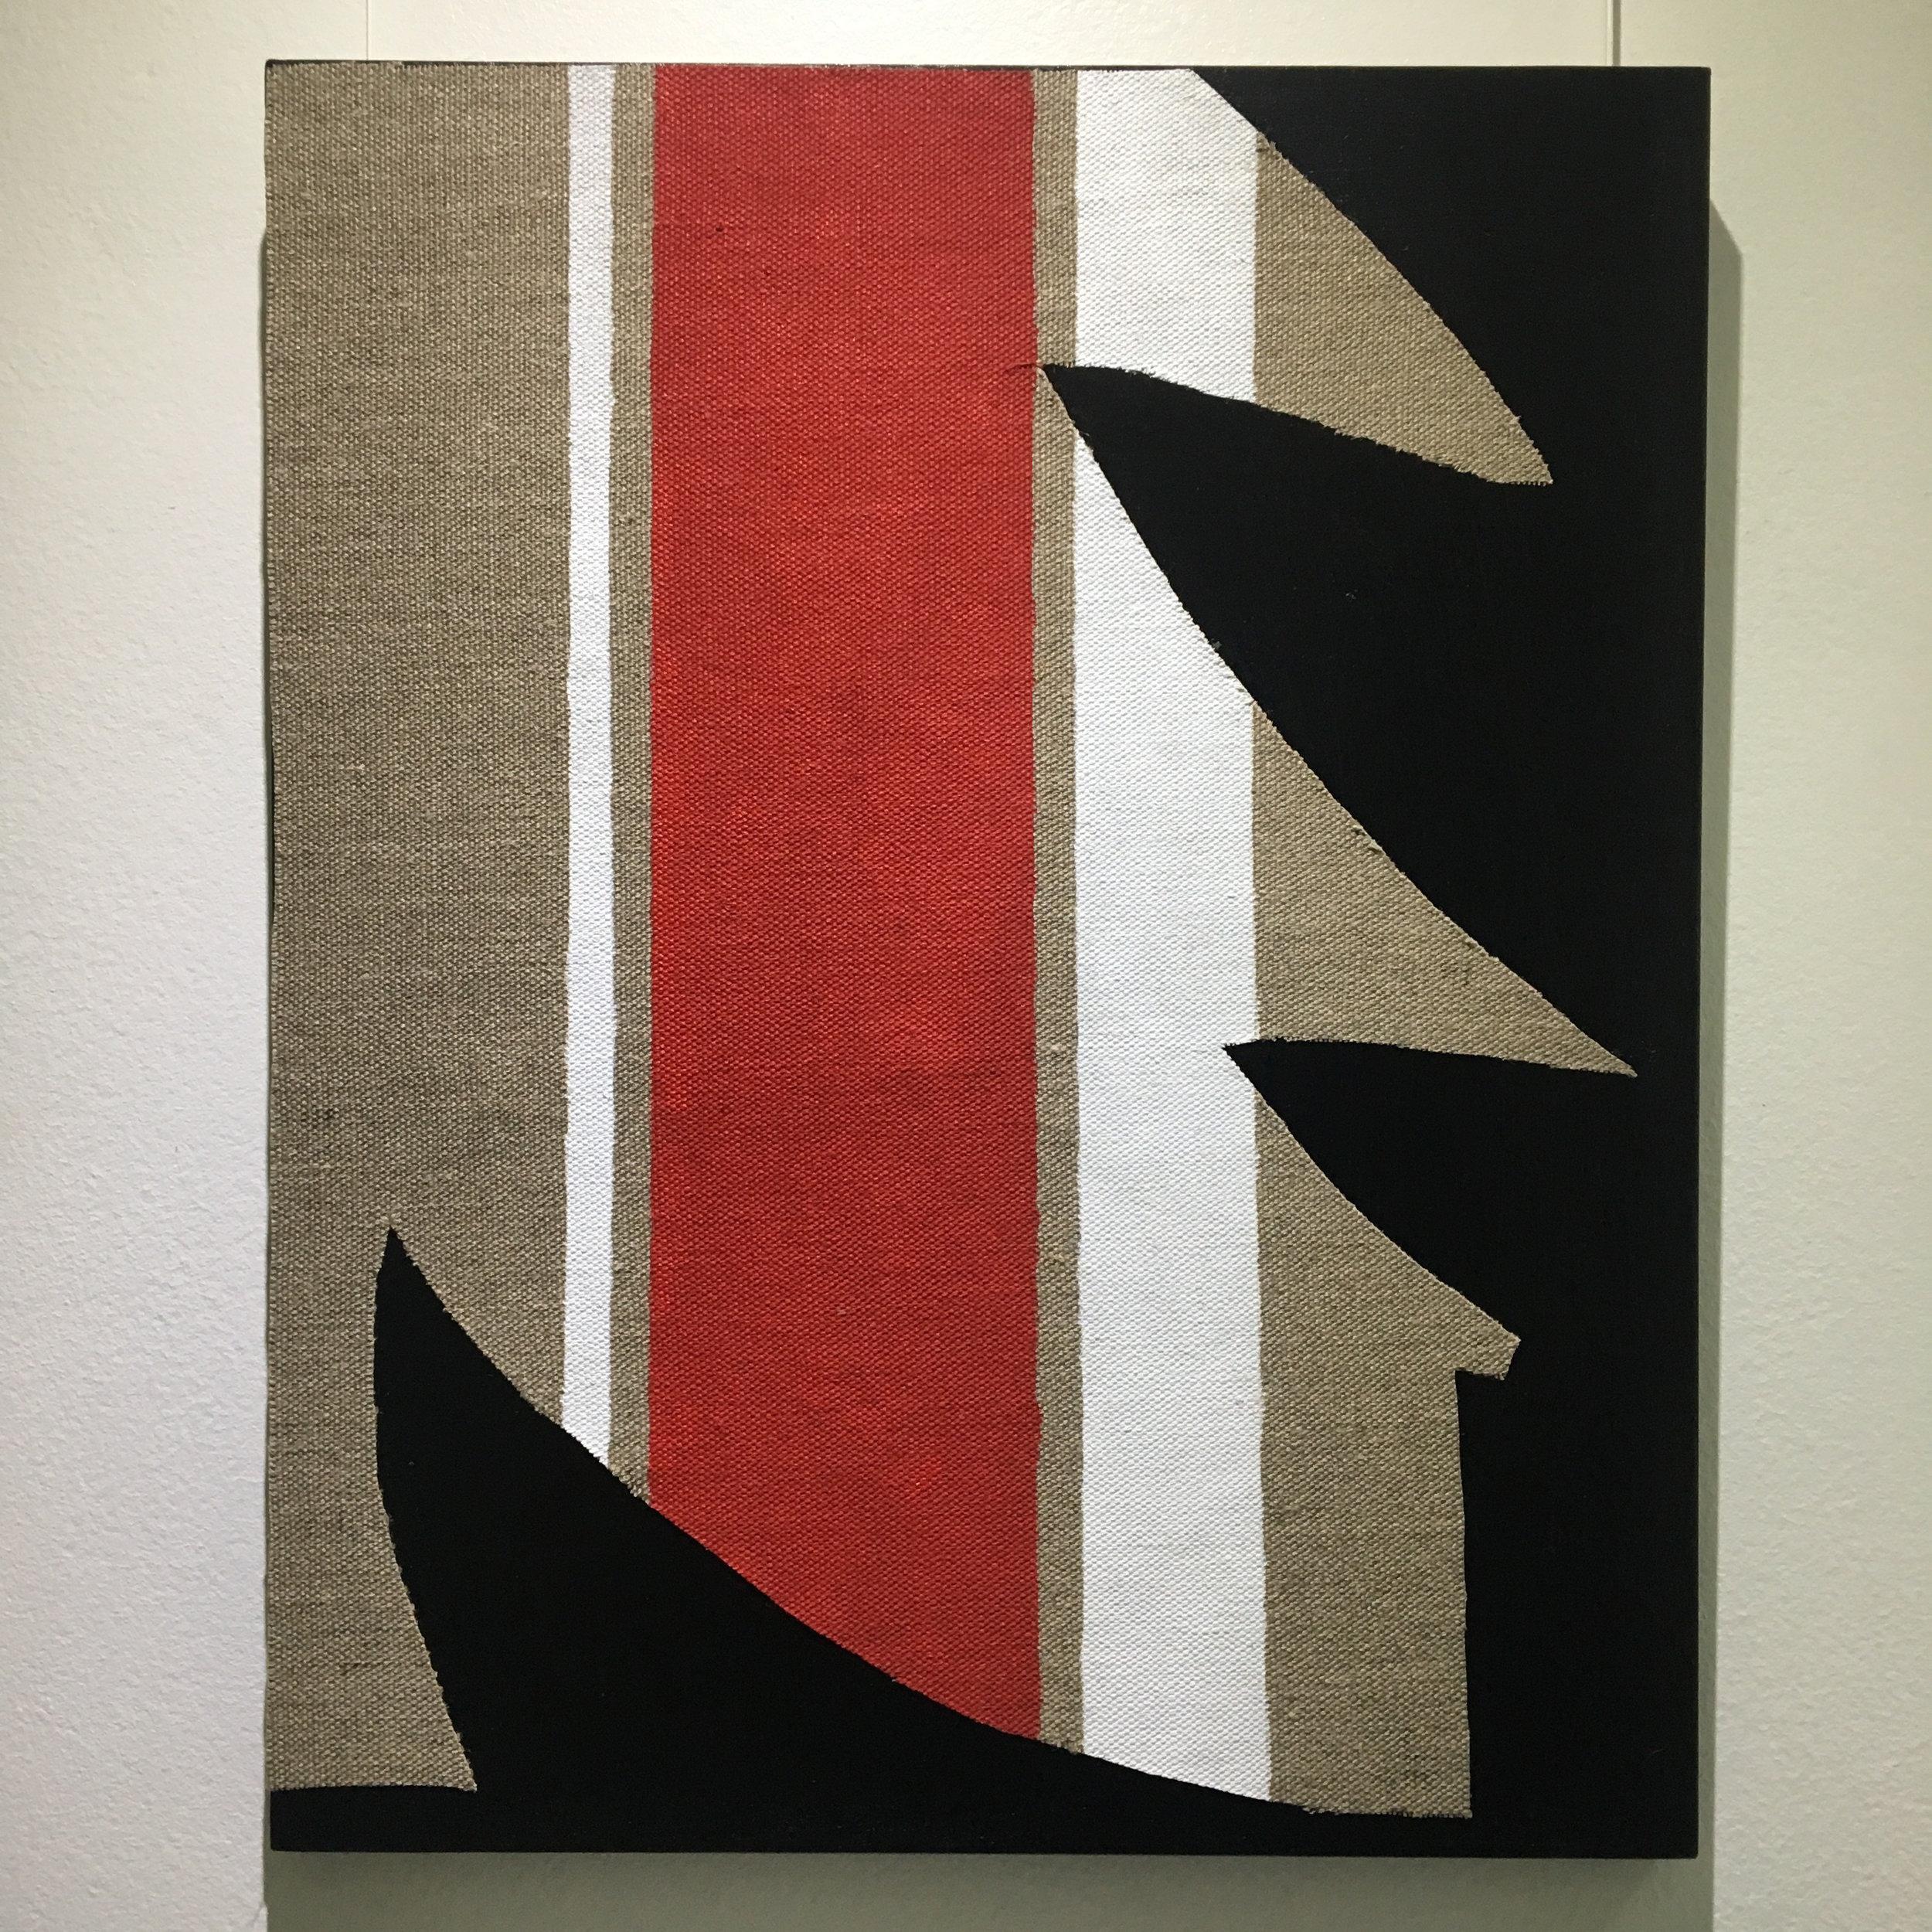 Elizabeth Pulie, #87 (la commedia dell'arte), 2018, acrylic and linen on board